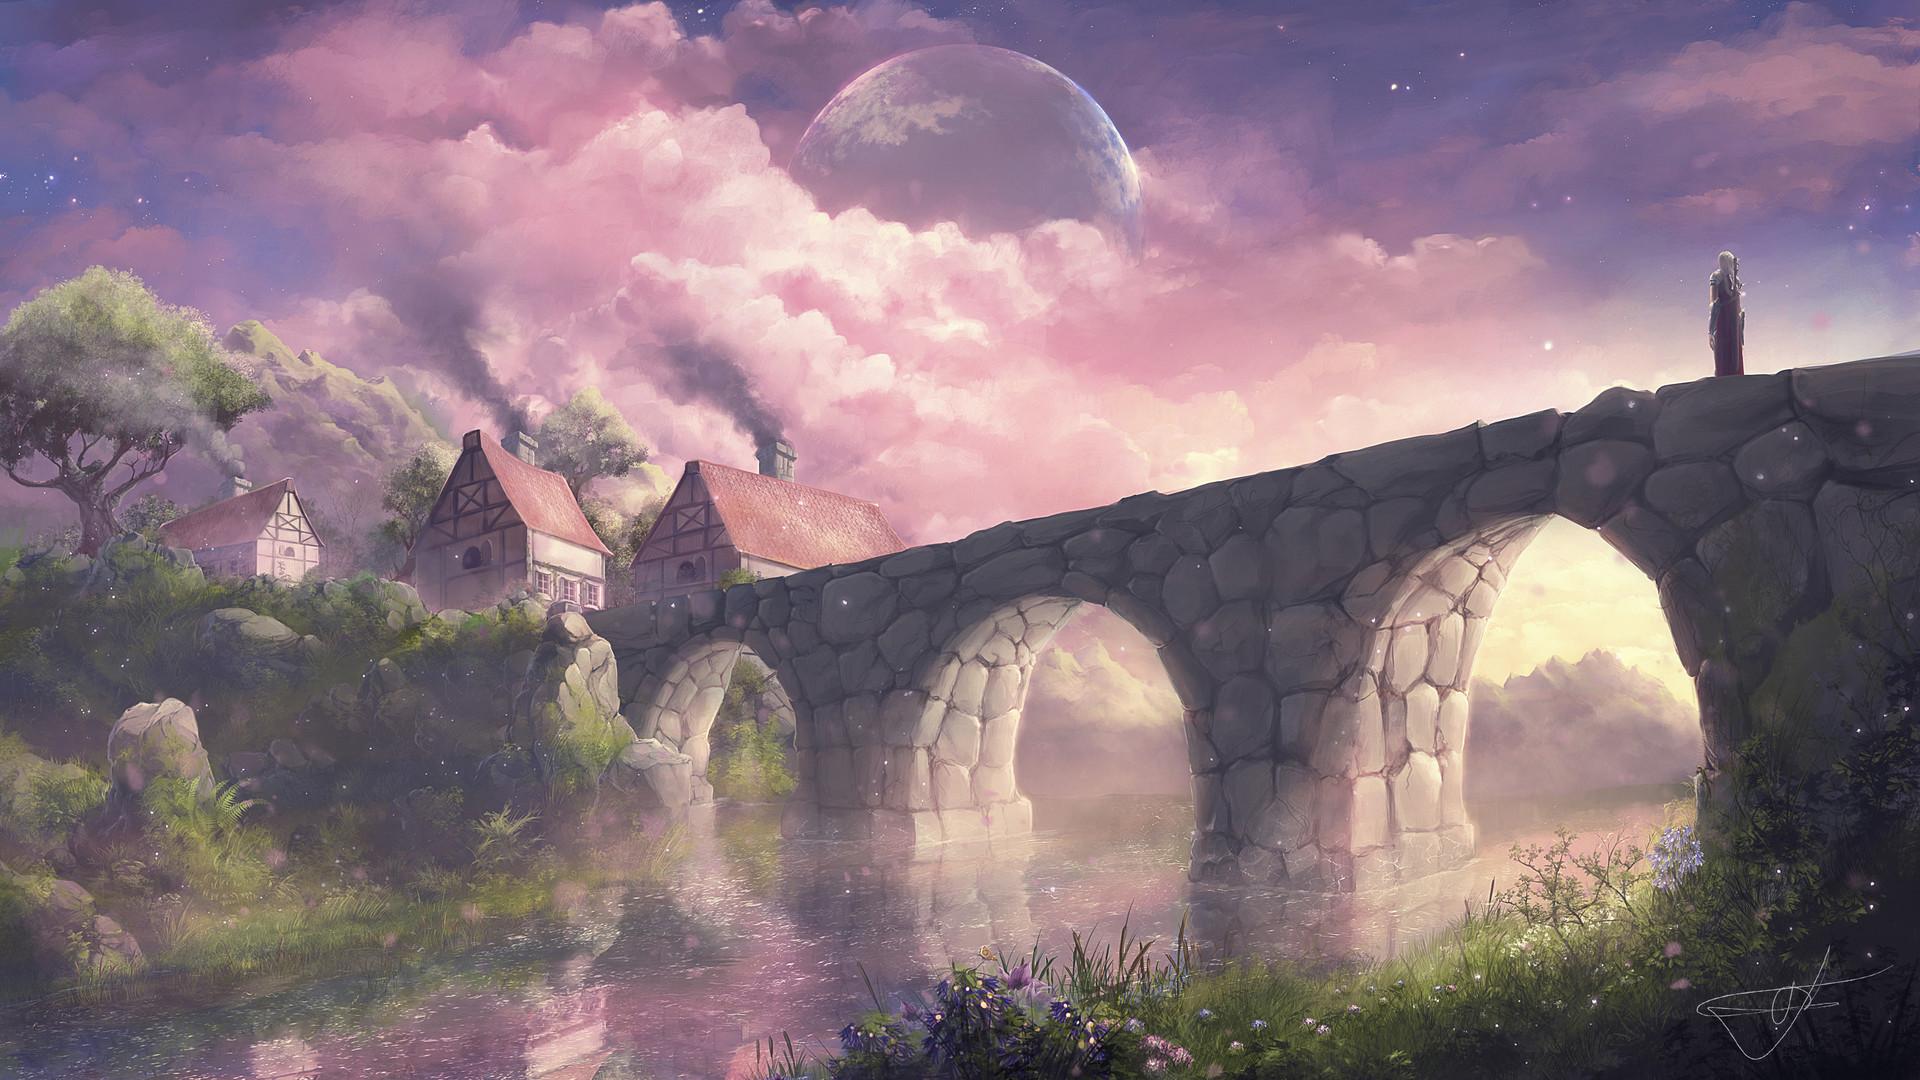 General 1920x1080 Max Suleimanov digital art landscape village pink clouds bridge cottage trees planet